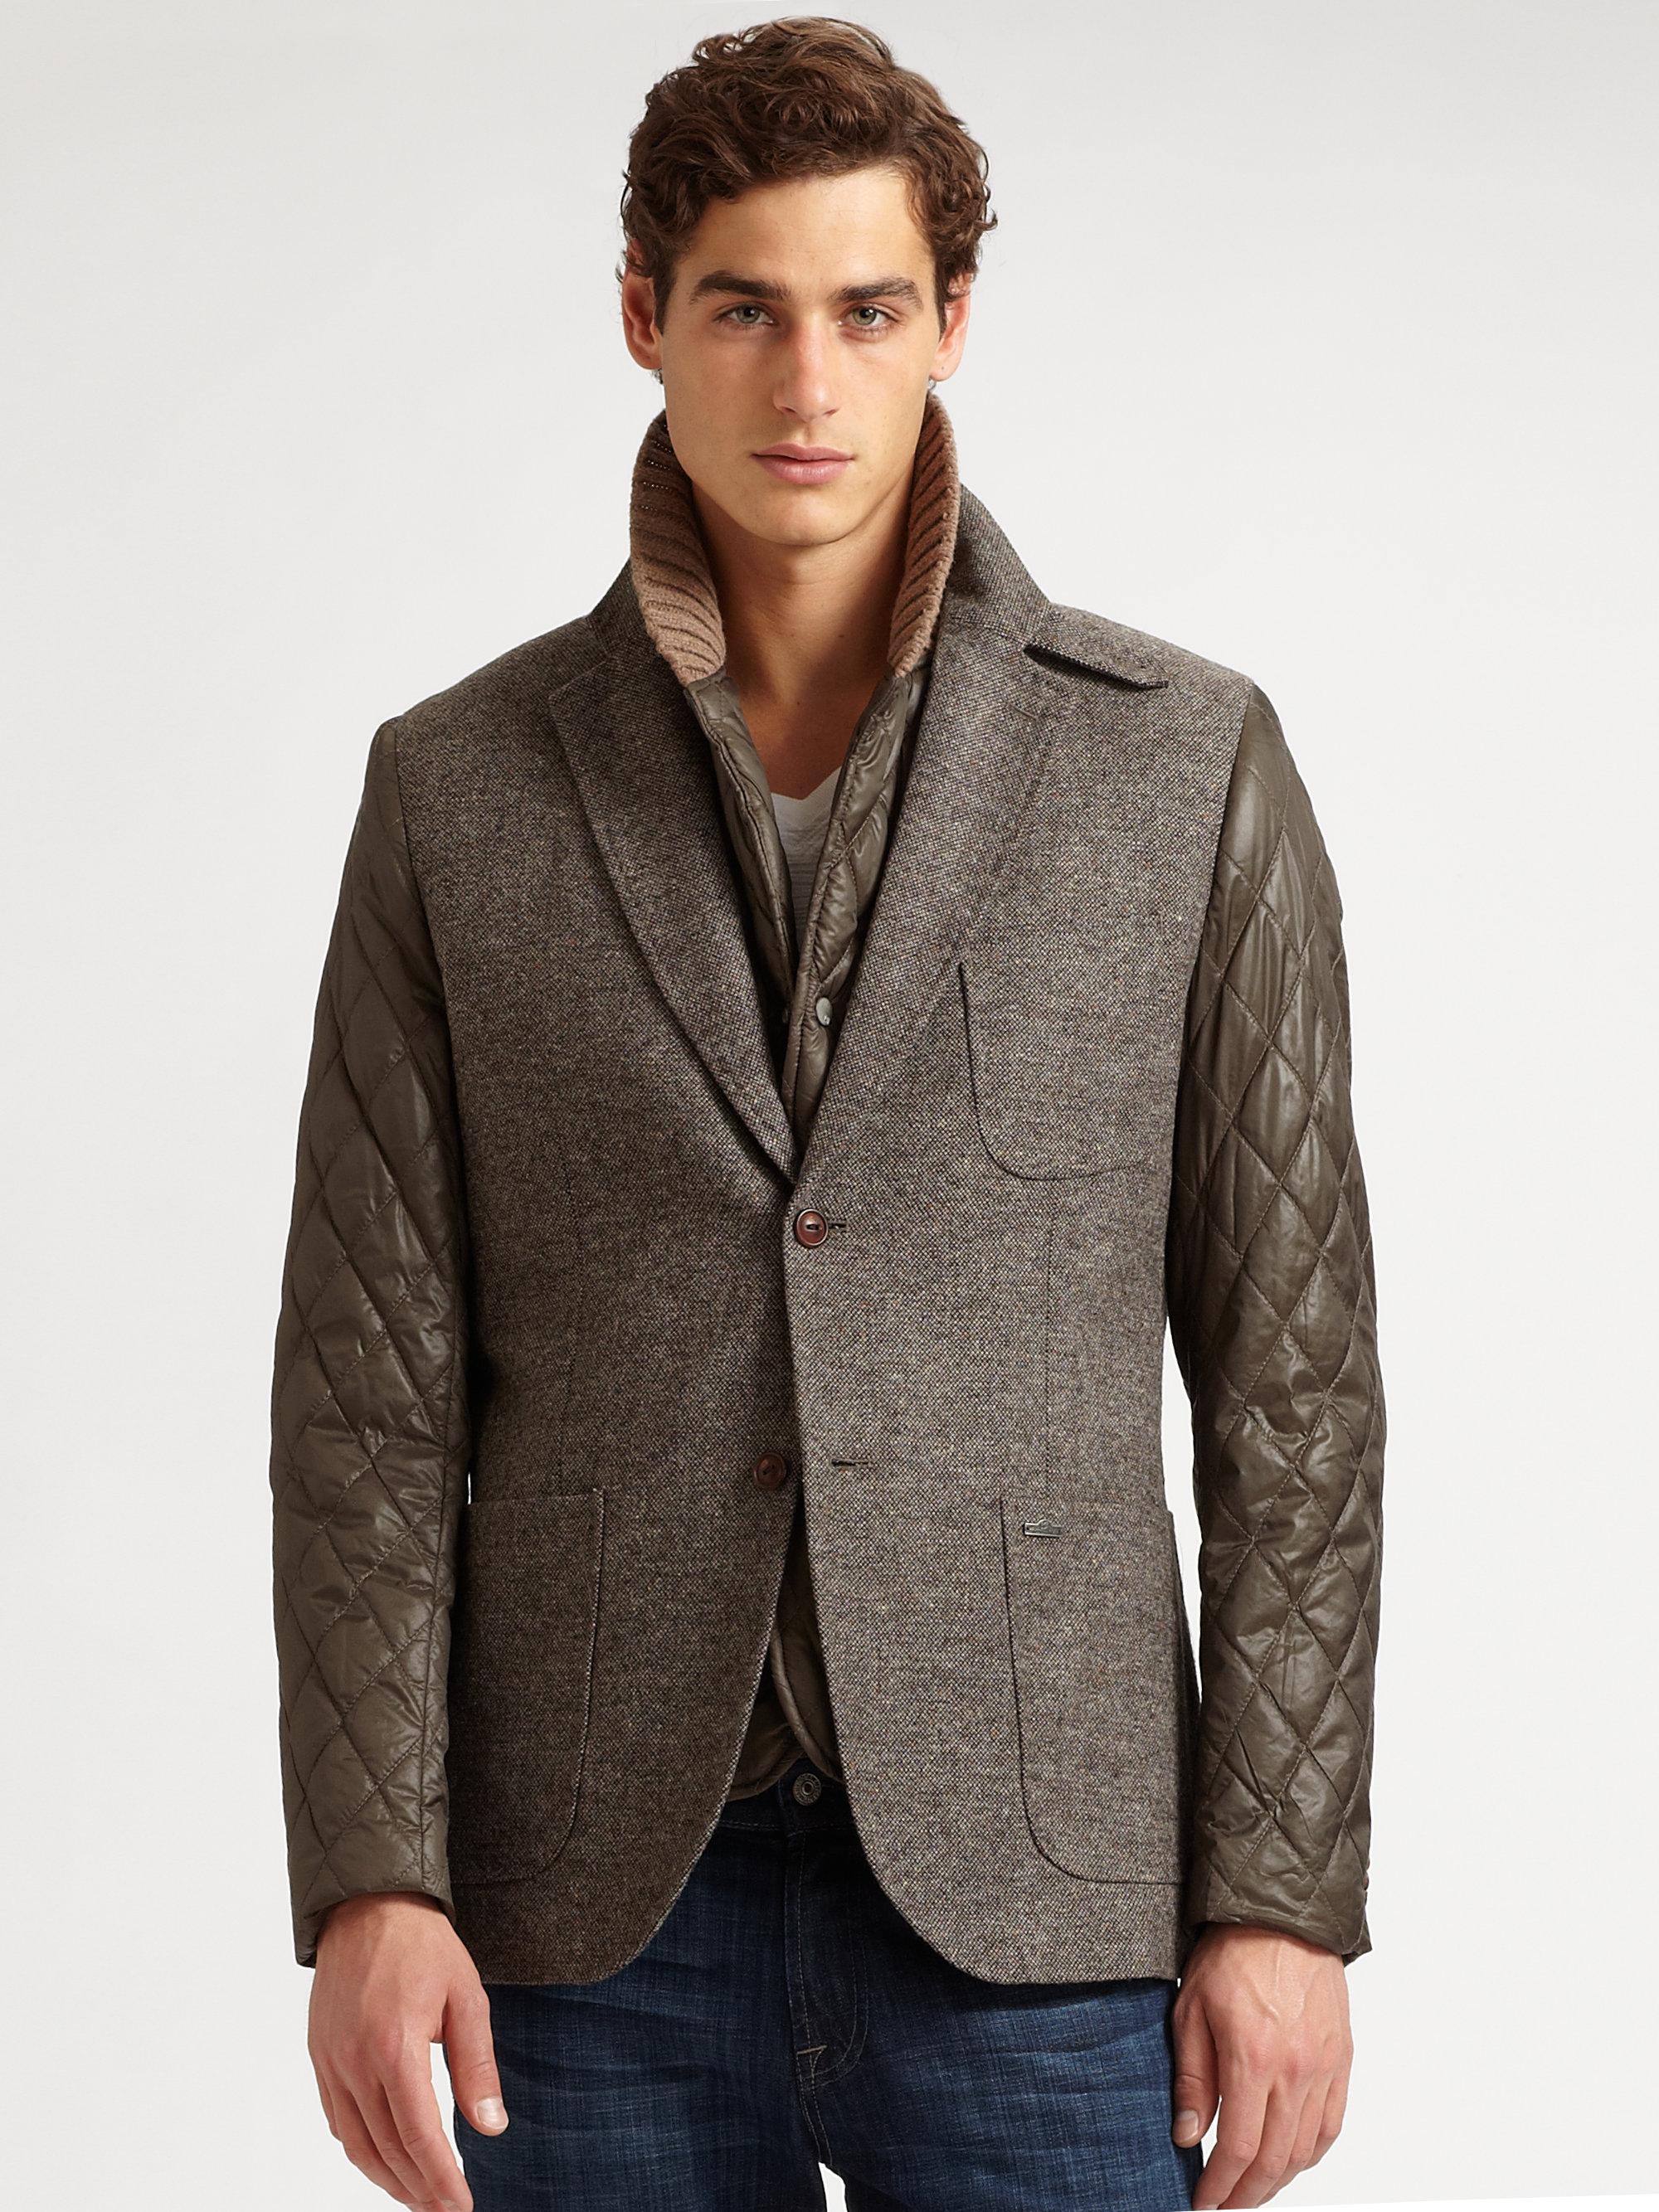 Tweed Coat Mens Photo Album - Reikian